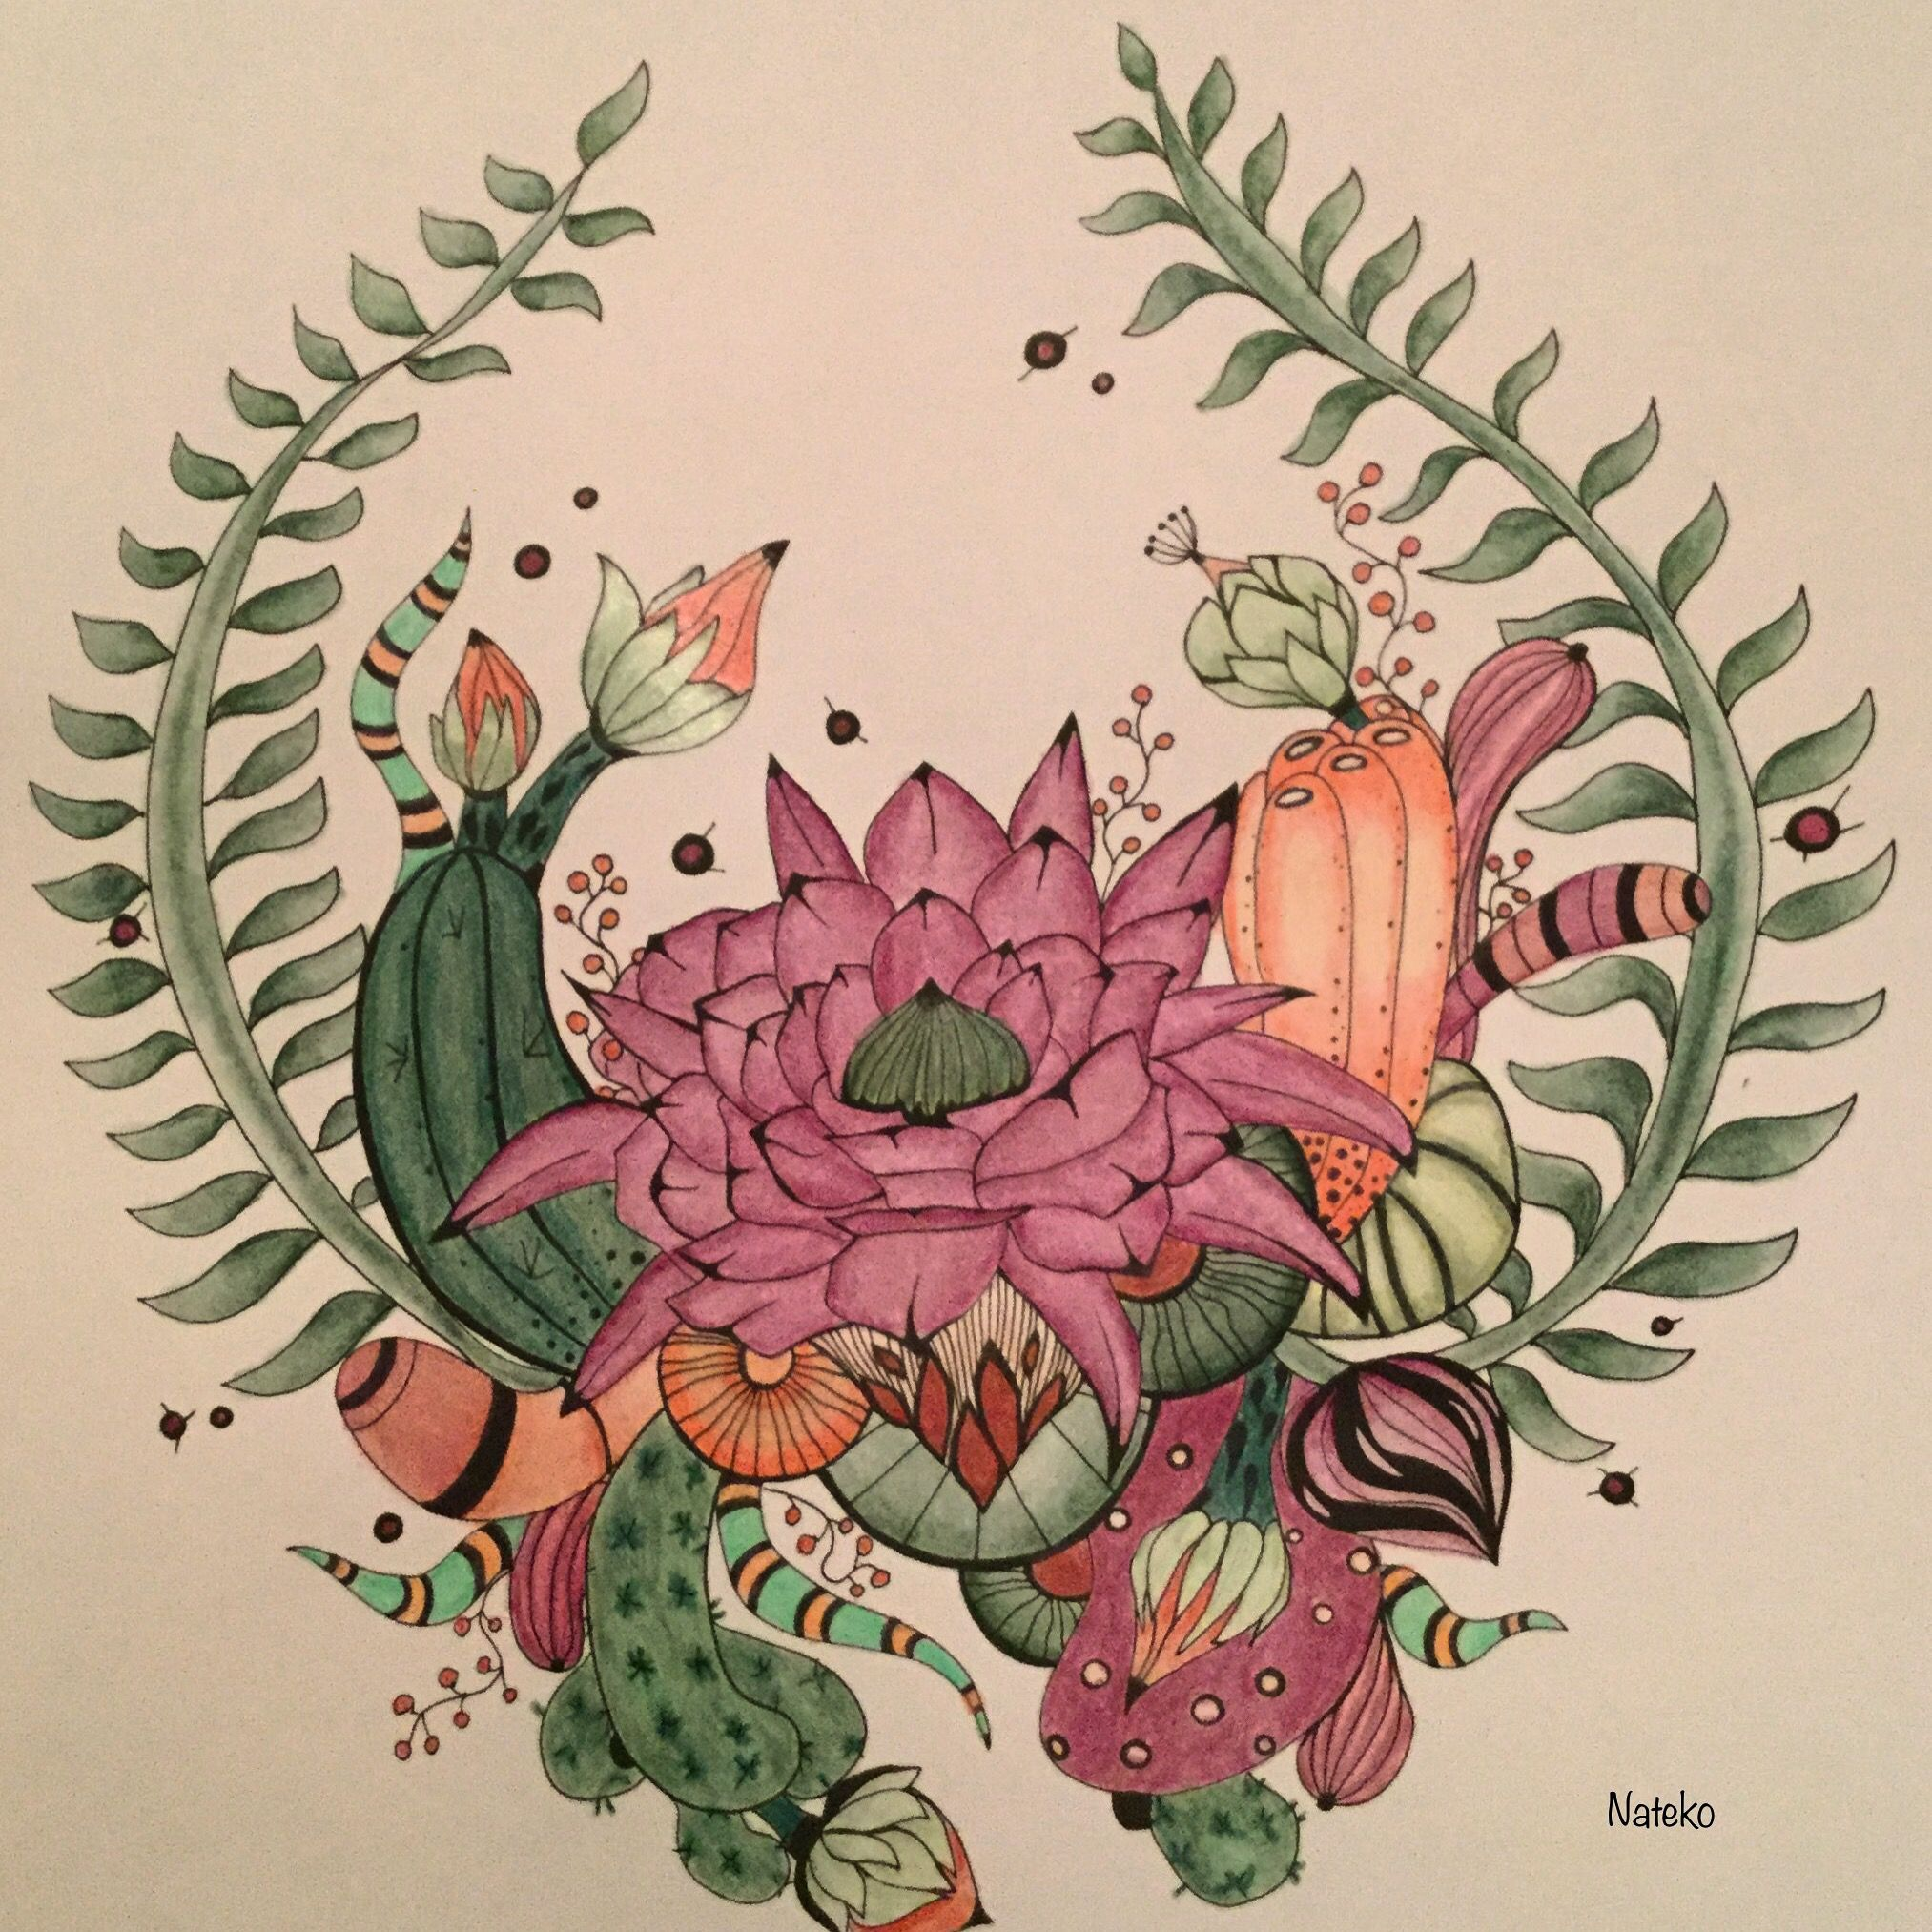 Botanical art coloring book - My Coloring Rachel Reinert Botanical Wonderland Desert Wonderland Johanna Basfordcoloring Booksdesertswonderlandpencilcoloringpaintings